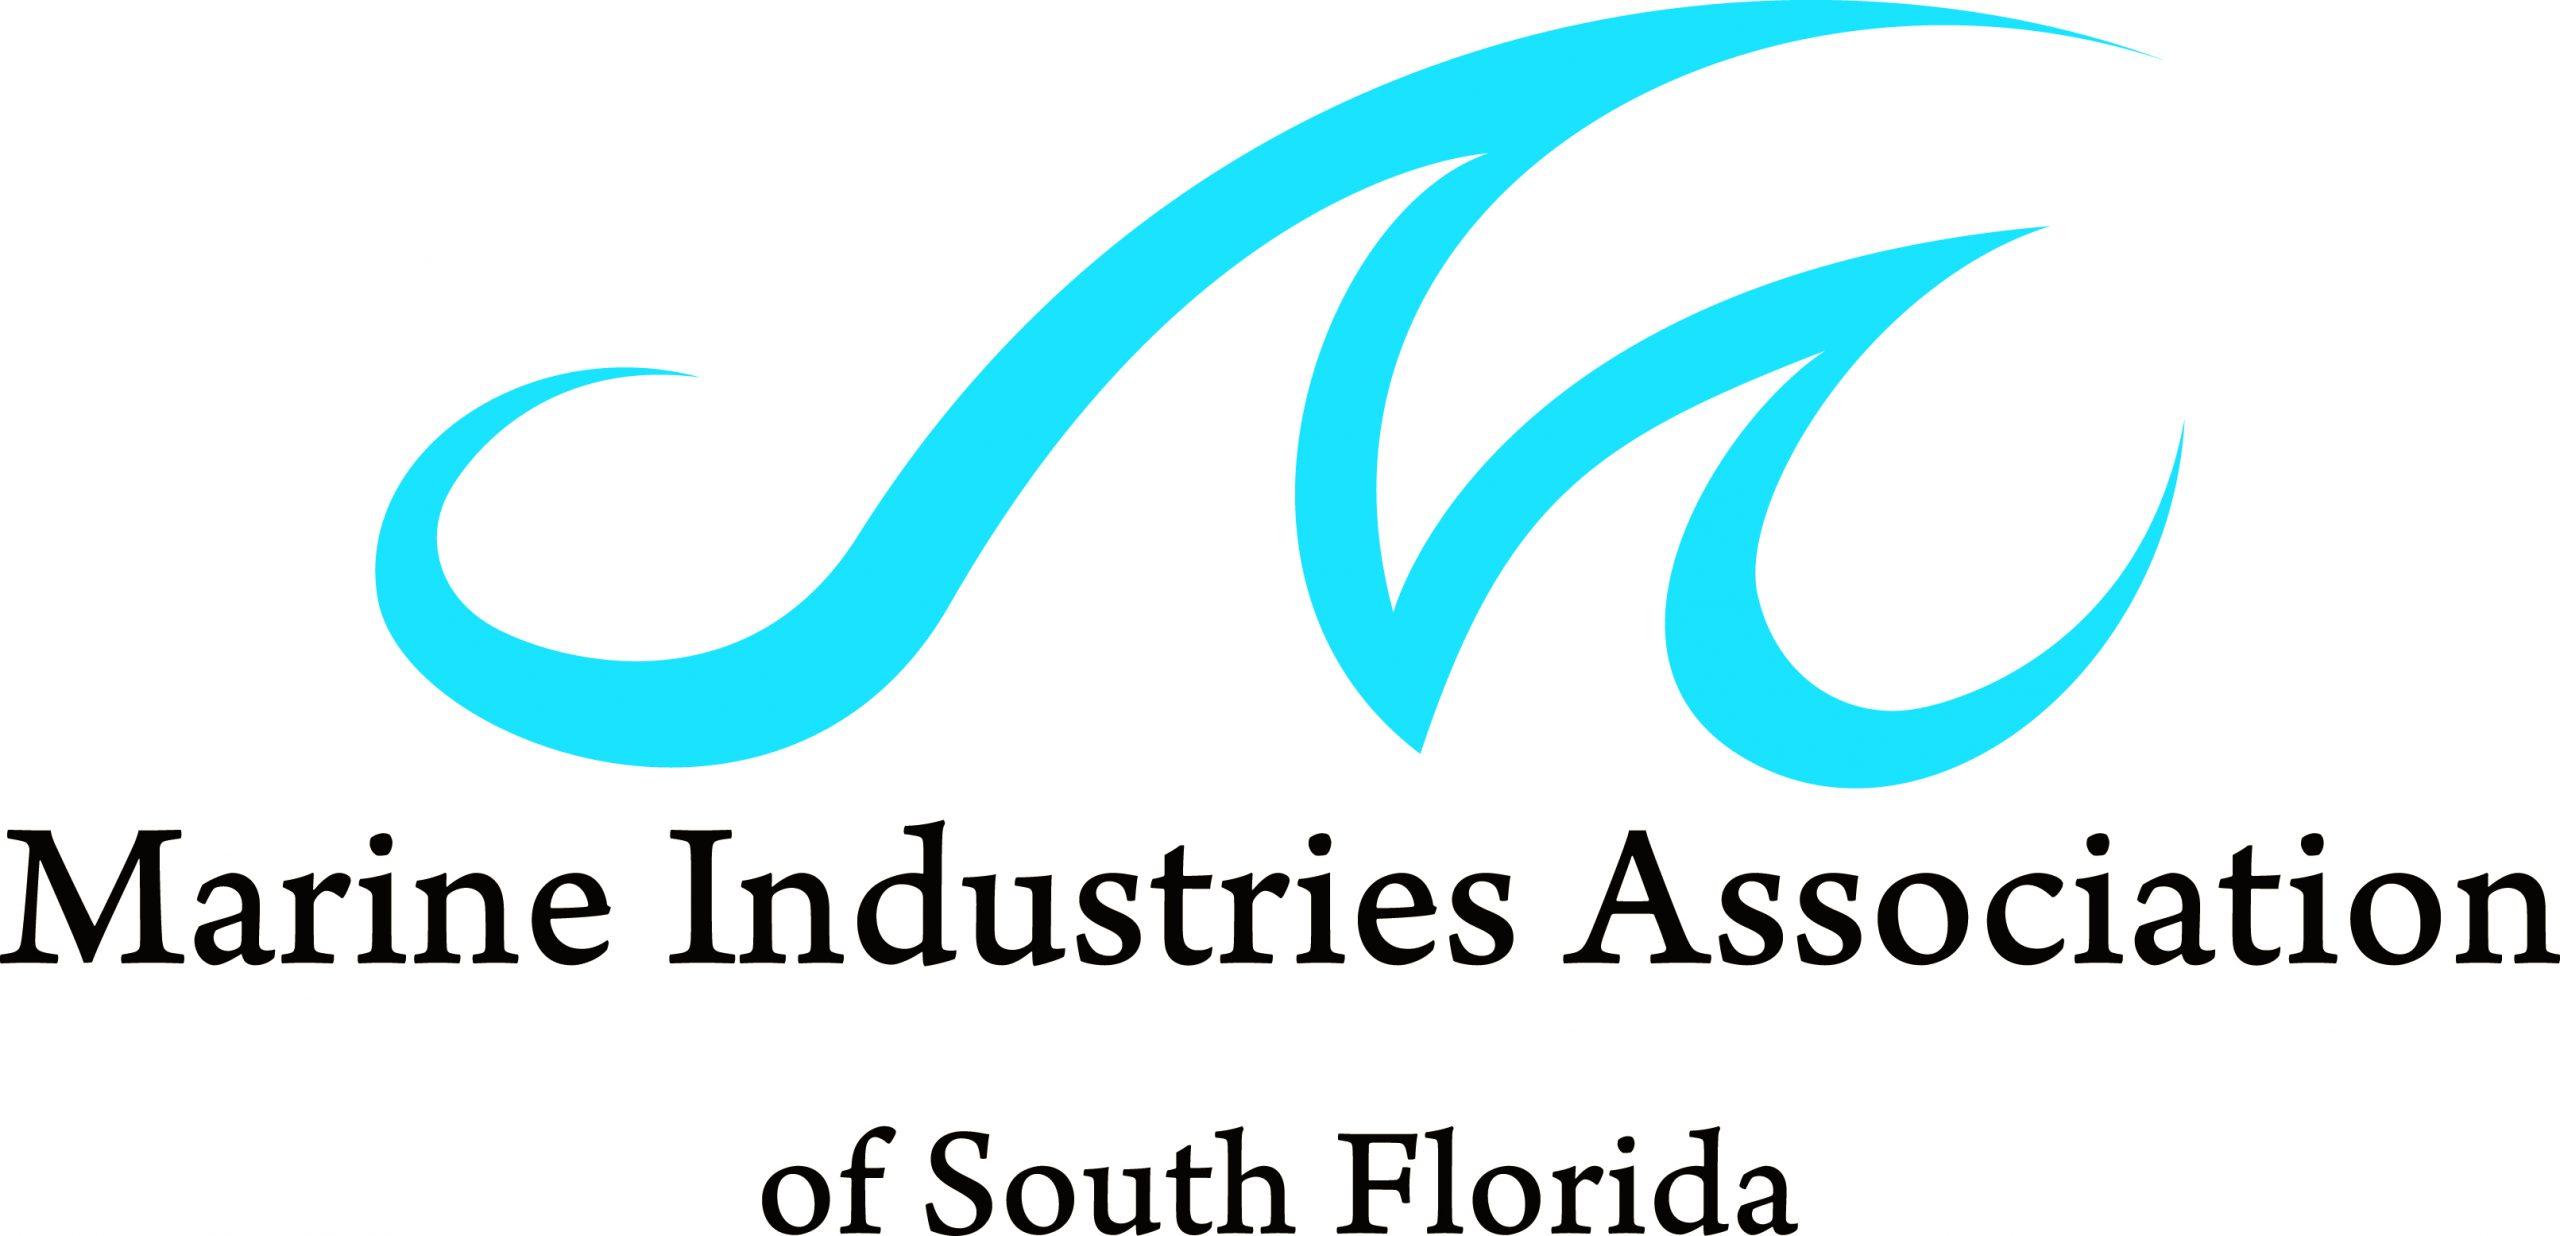 Marine Industry Association South Florida (MIASF) Logo